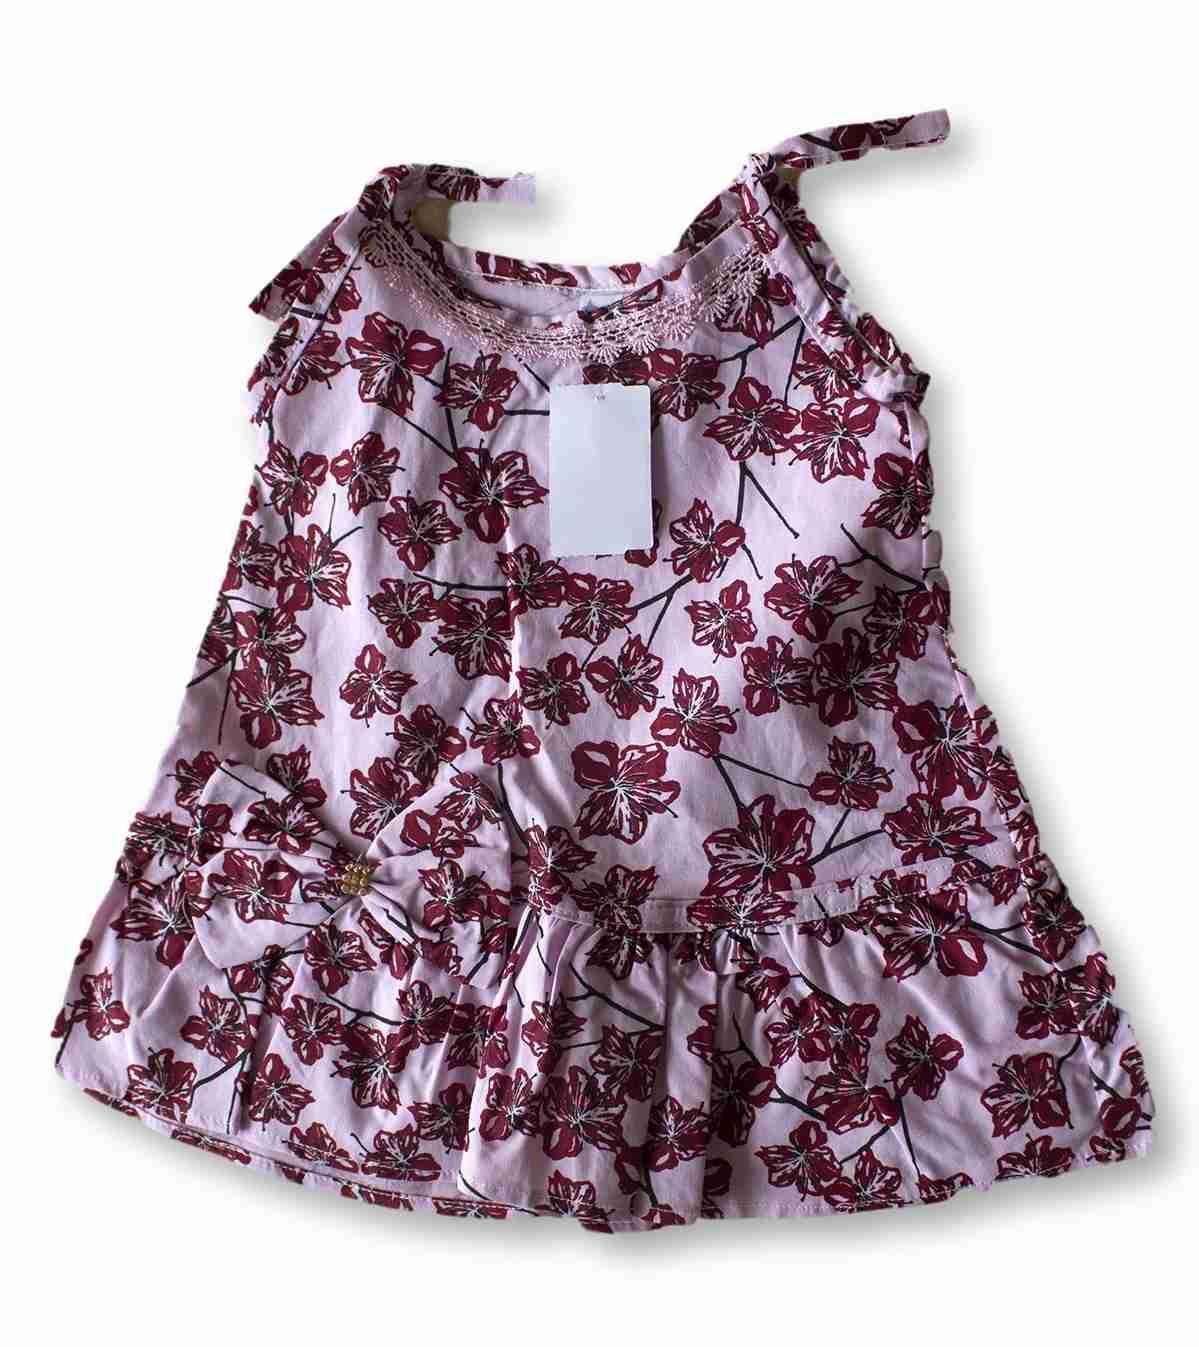 Vestido Bolero Bebê Recém Nascido Feminino Menina Cod 9091